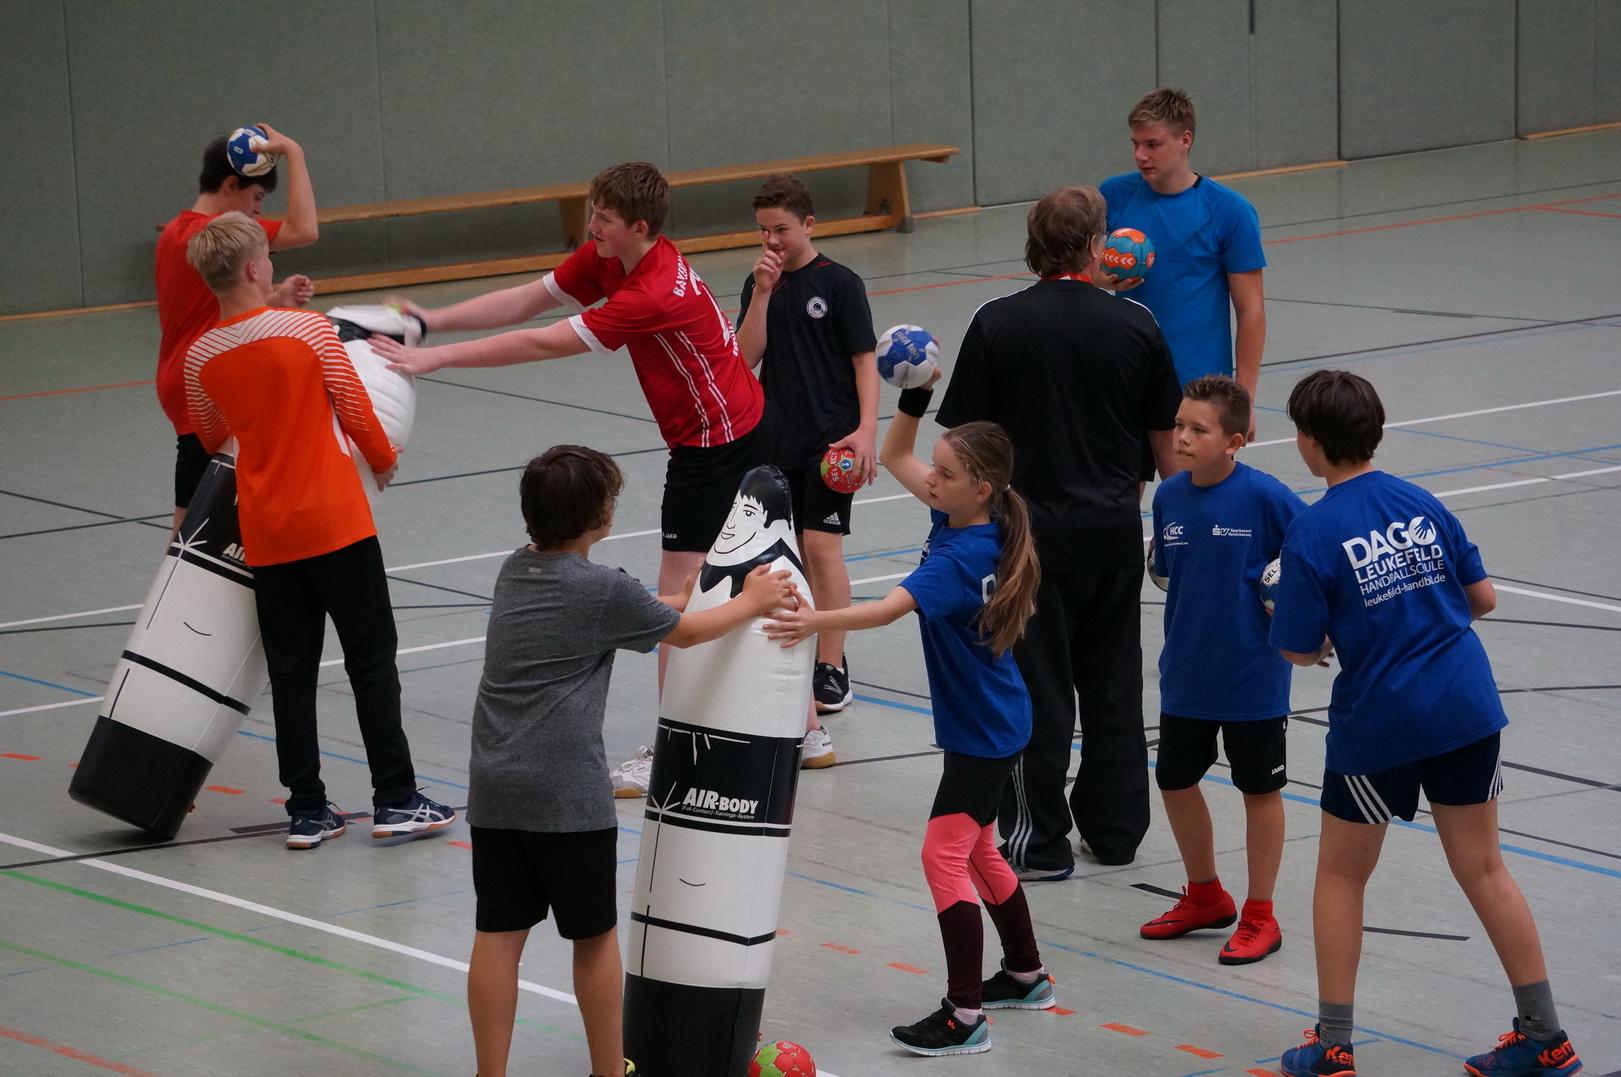 201808_Handballcamp_SDH_MG_242w